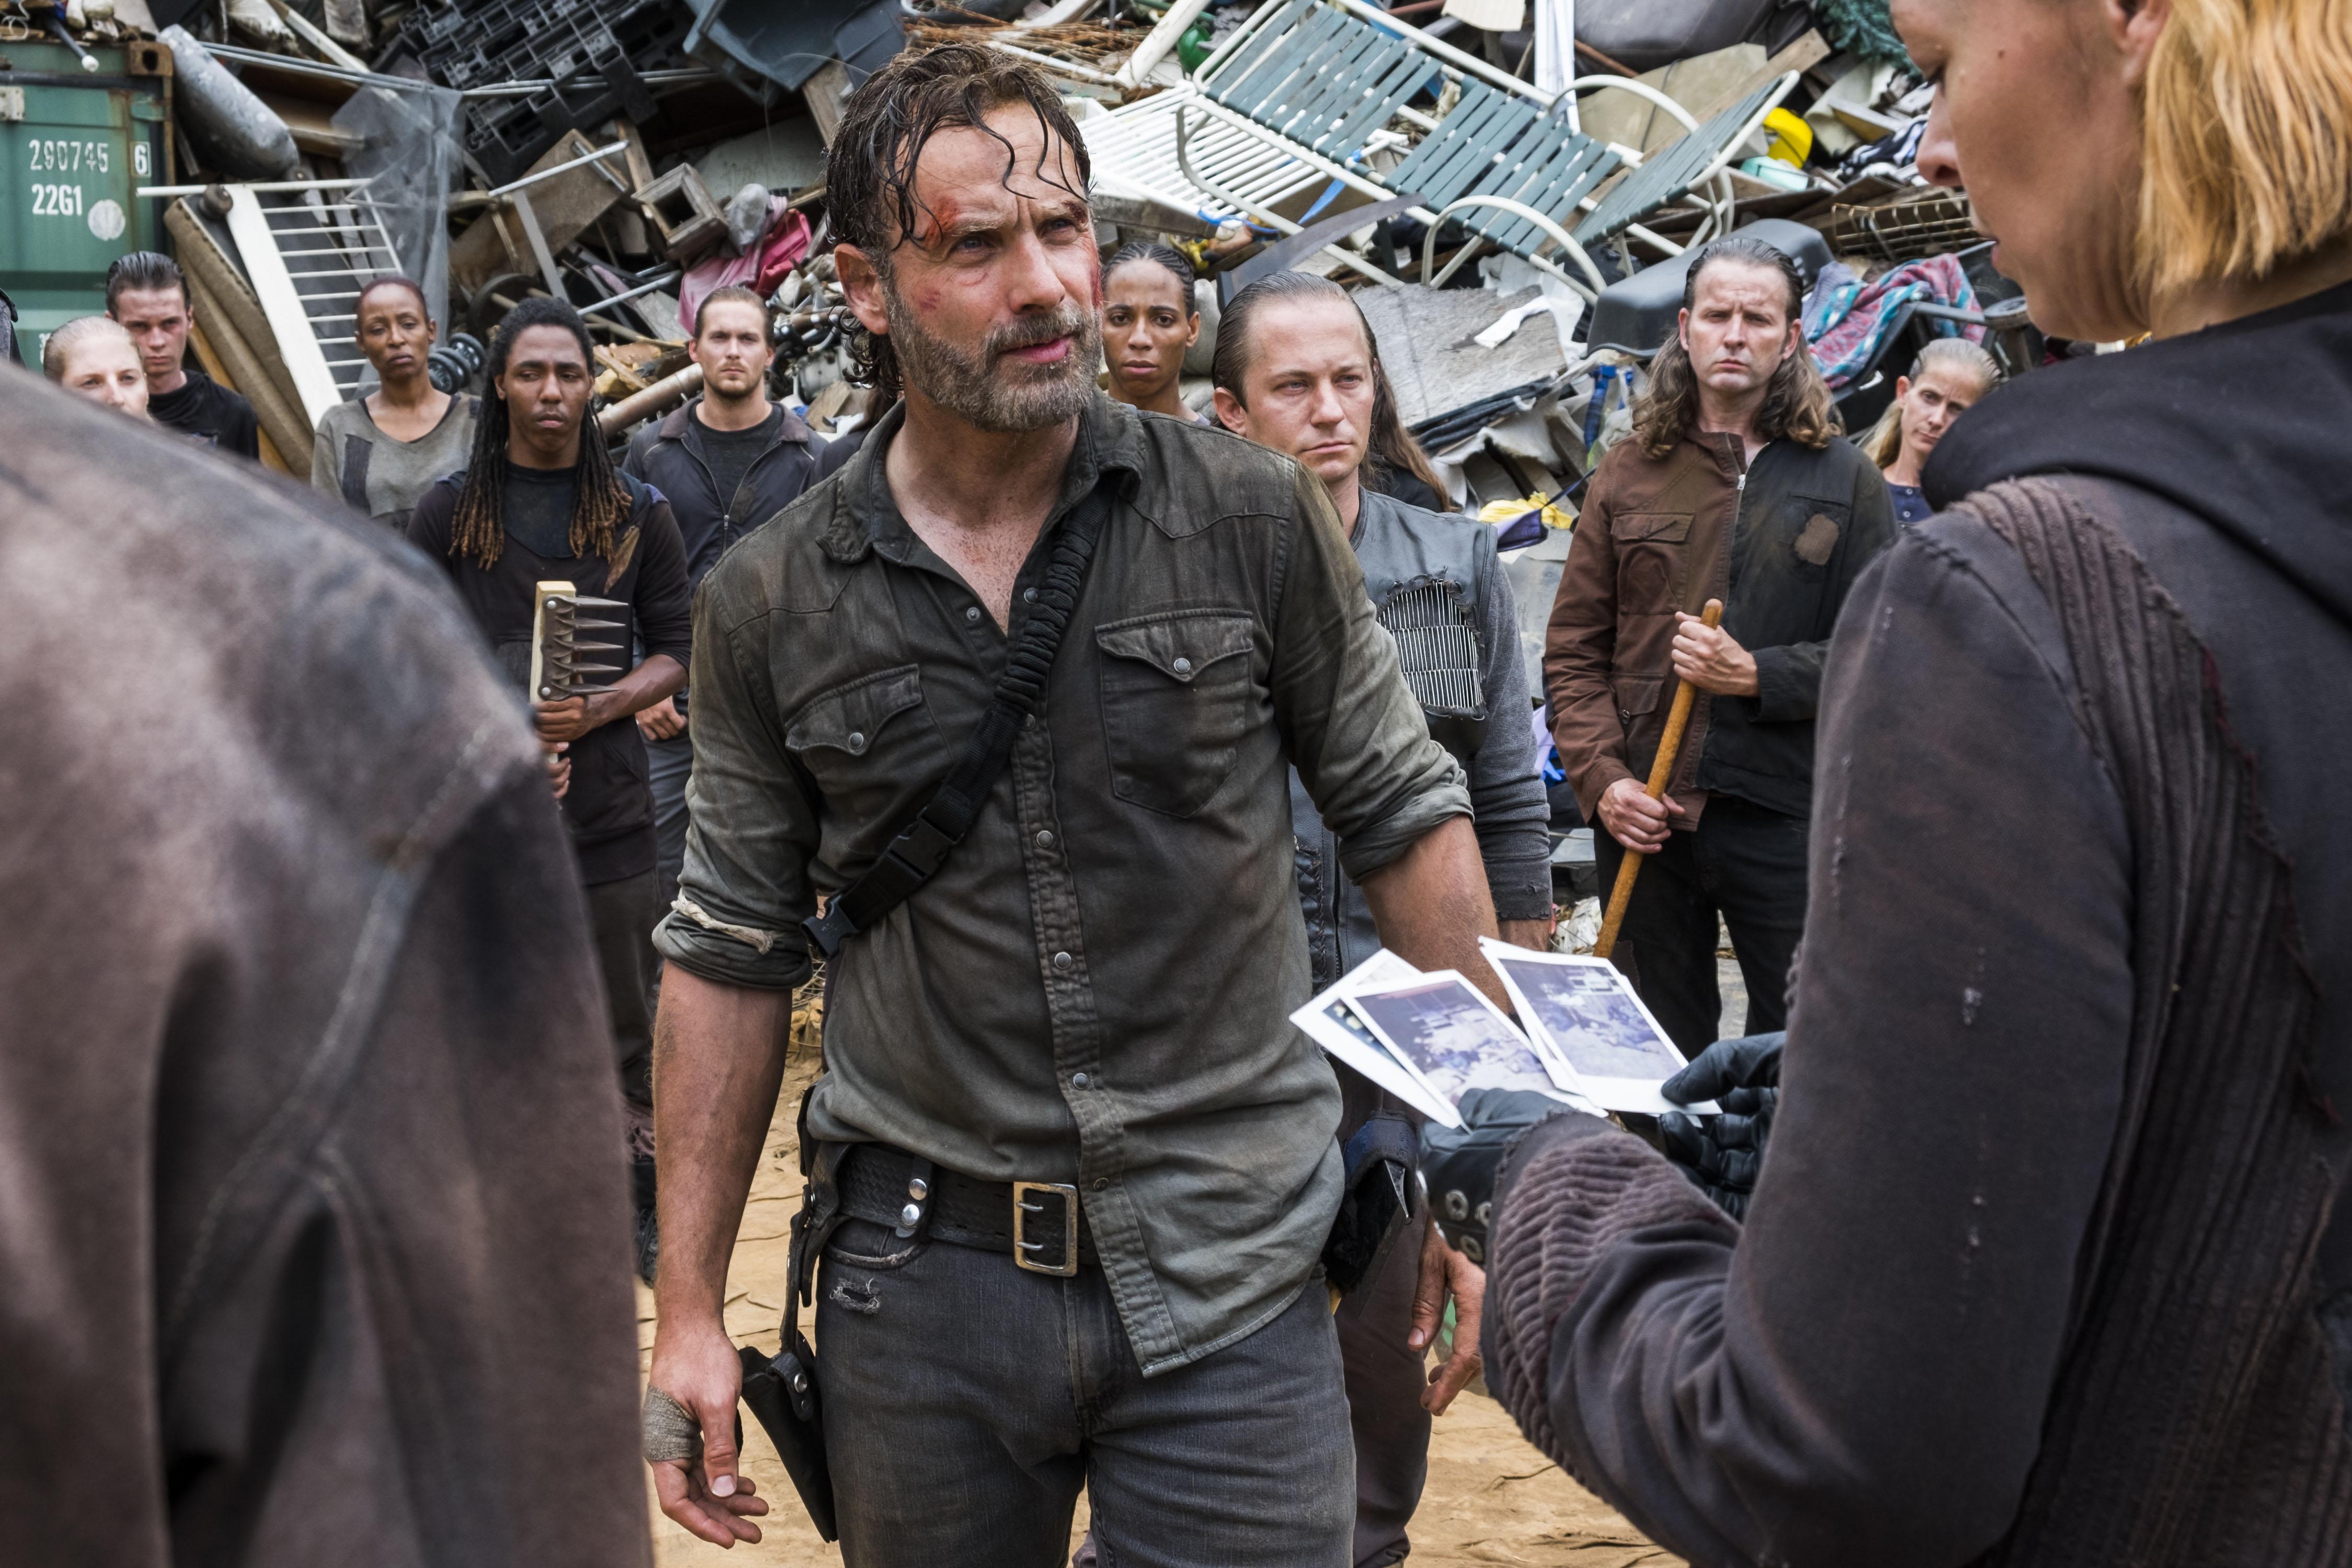 Andrew Lincoln as Rick Grimes, Pollyanna McIntosh as Jadis - The Walking Dead _ Season 8, Episode 6 - Photo Credit: Gene Page/AMC